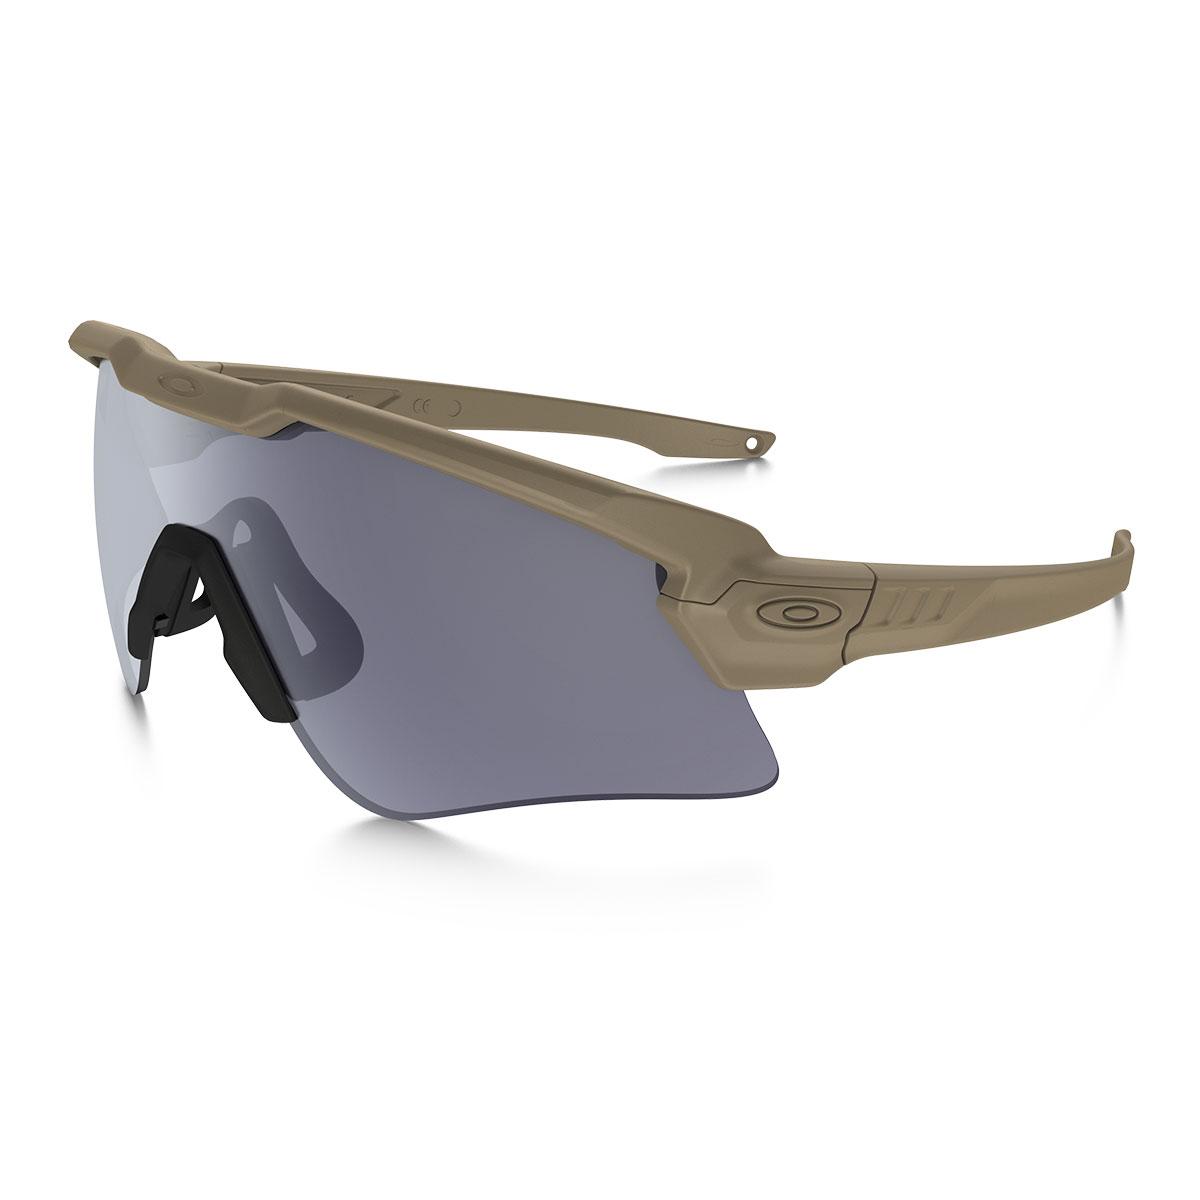 acb7ab8ce35 Oakley - SI Ballistic M Frame Alpha - Terrain Tan Frame w  Grey Lens ...